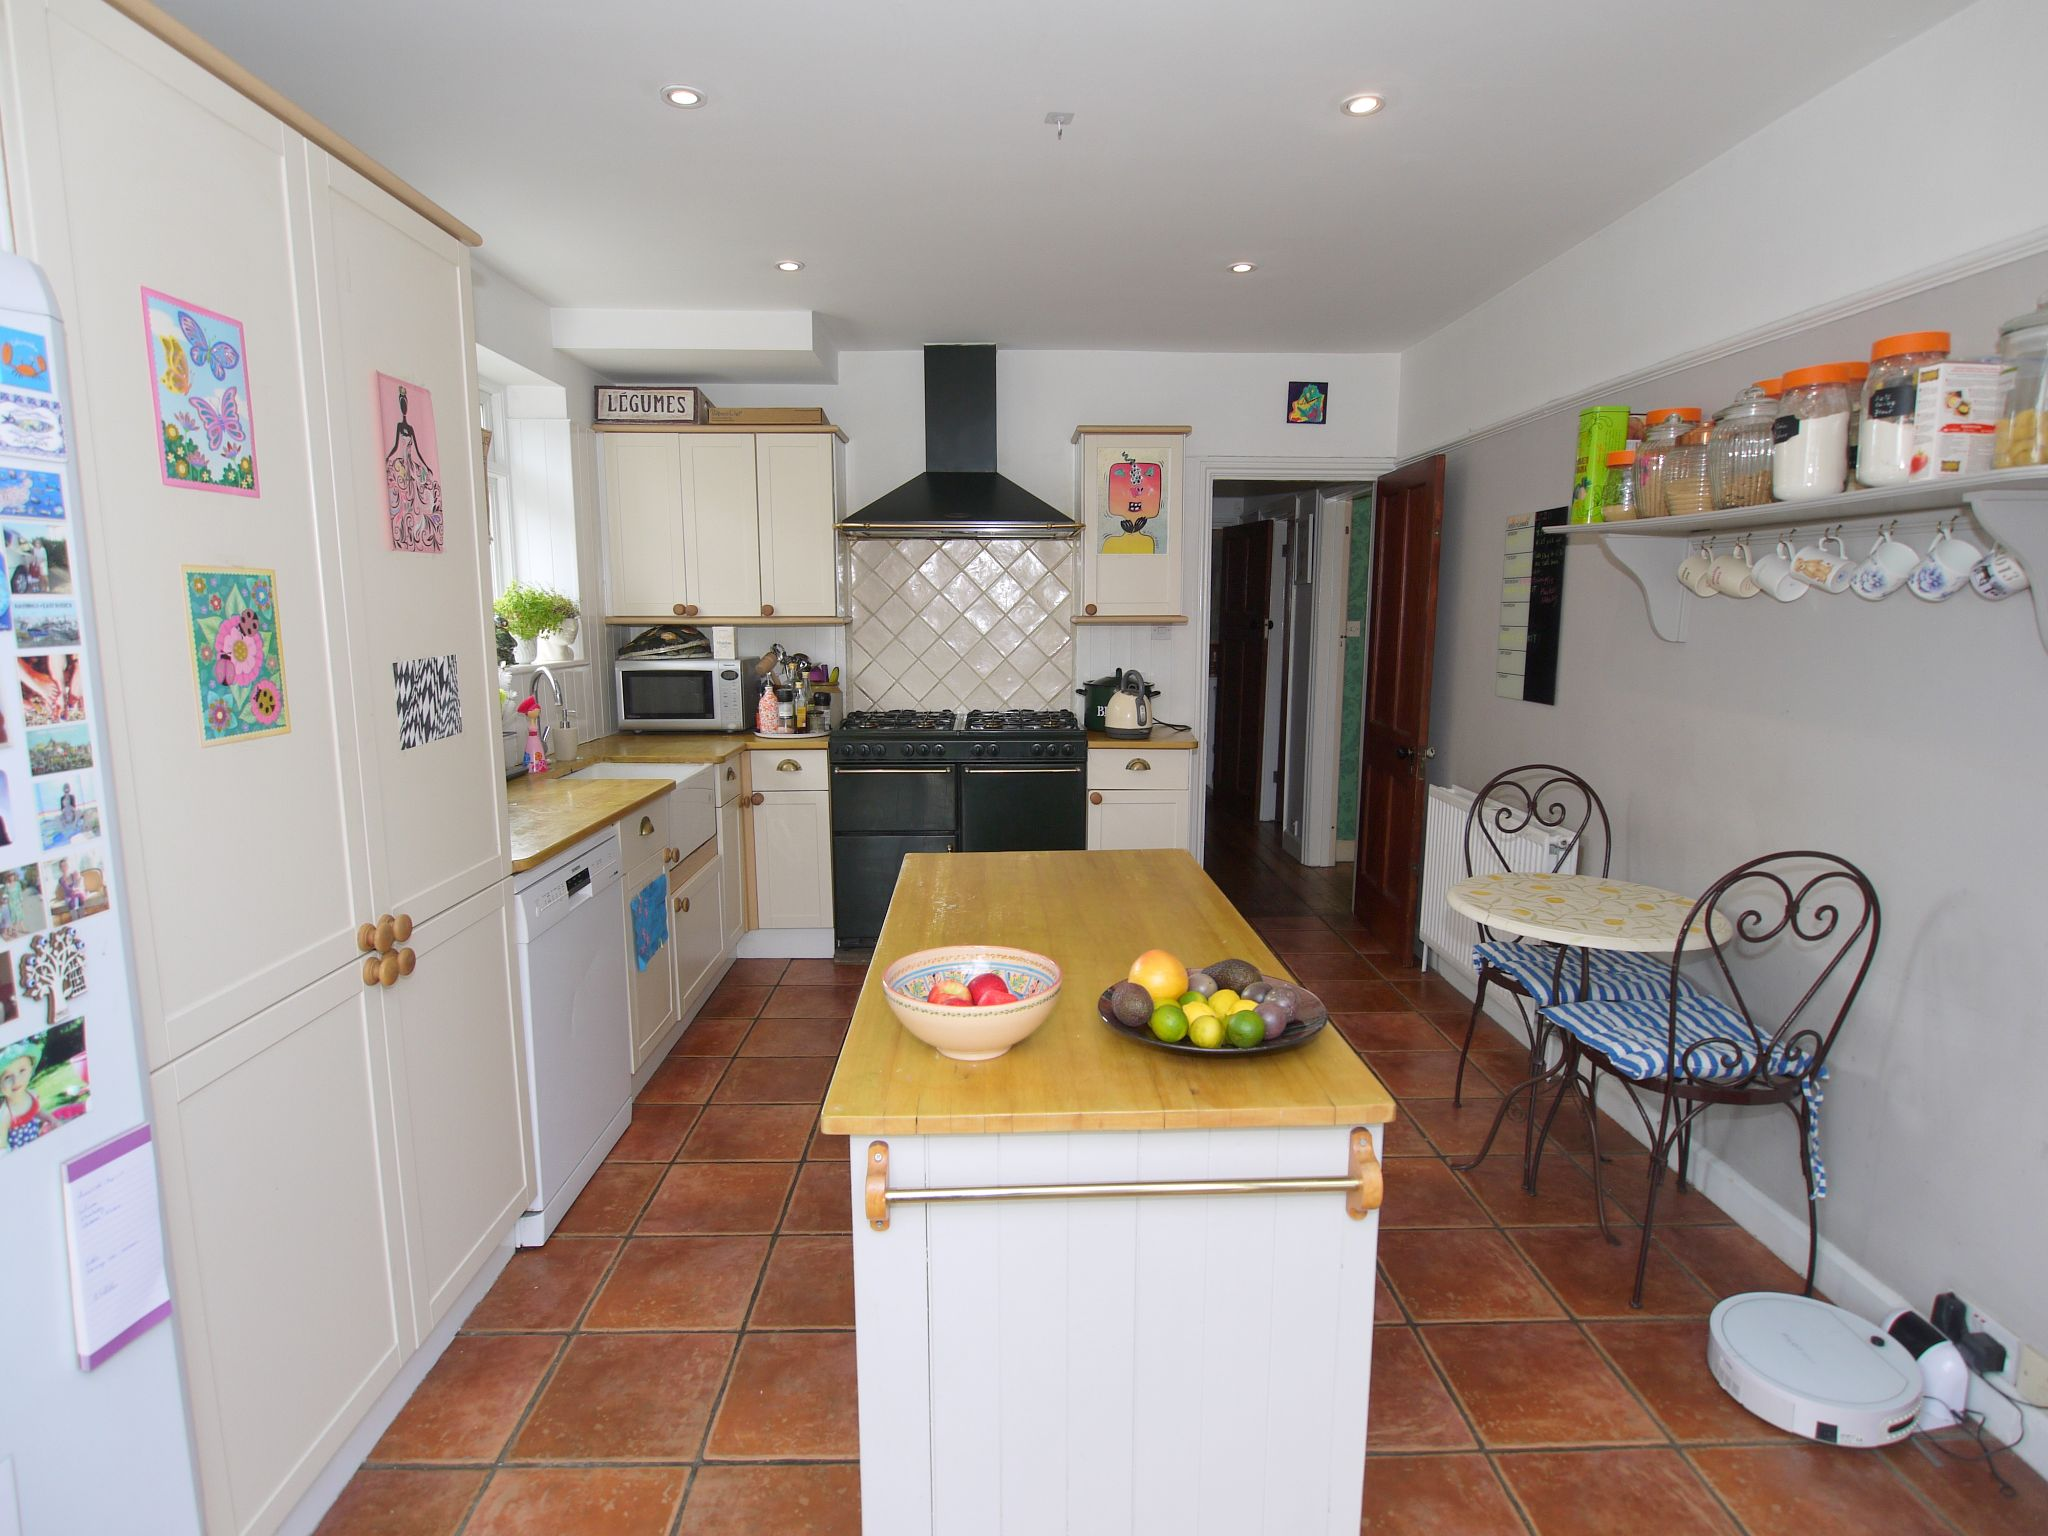 3 bedroom detached house Sold in Sevenoaks - Photograph 5